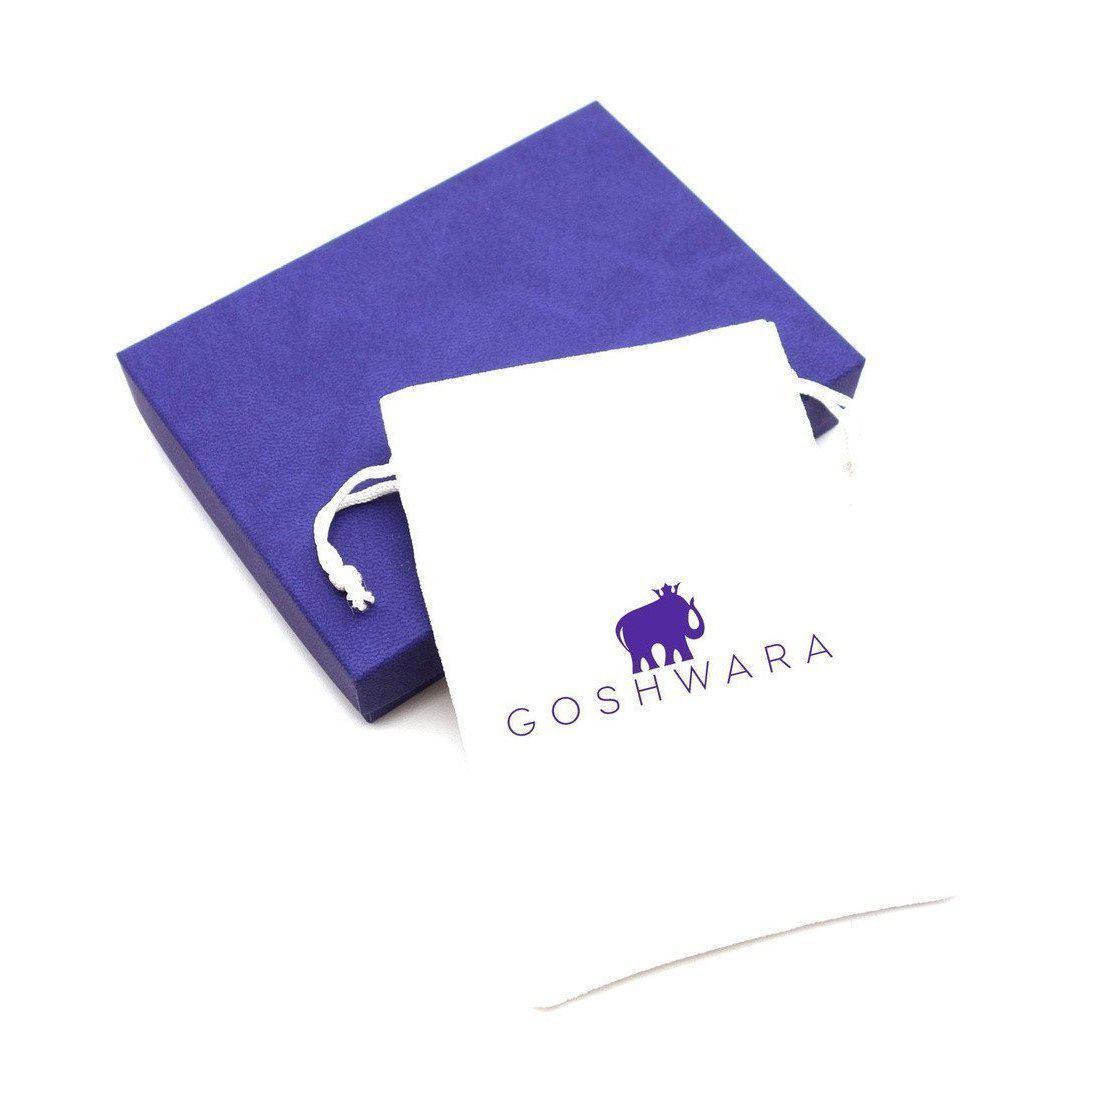 Goshwara Gossip Peridot Oval Stackable Rings With Diamonds in Metallic